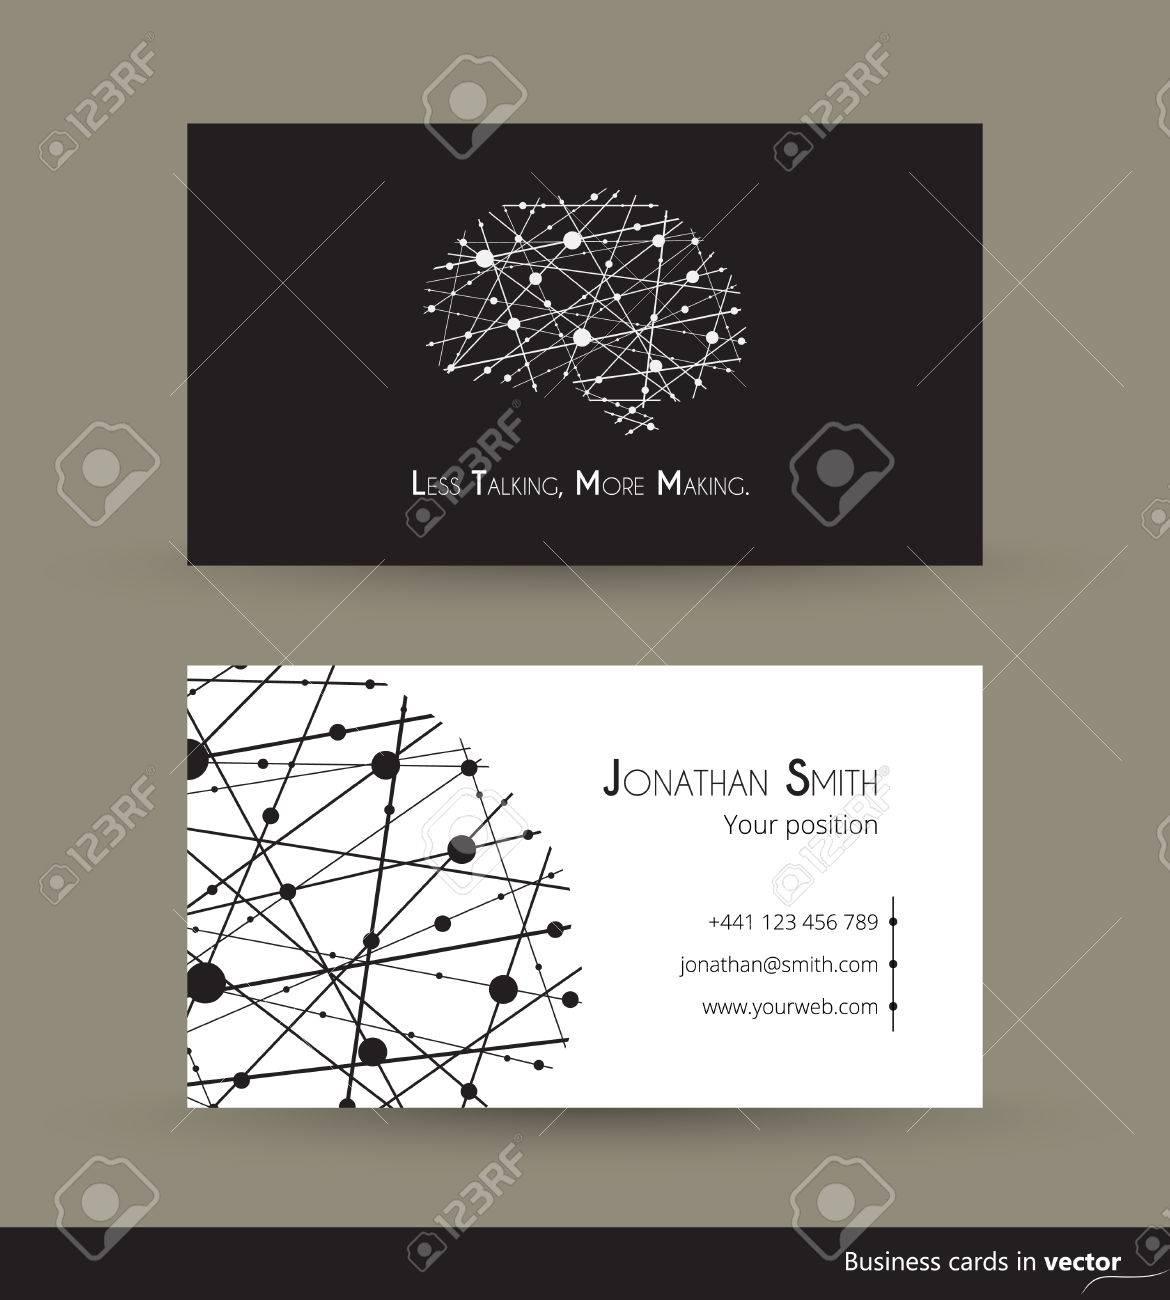 Make business cards nairobi images card design and card template business card maker nairobi images card design and card template make business cards nairobi gallery card reheart Choice Image